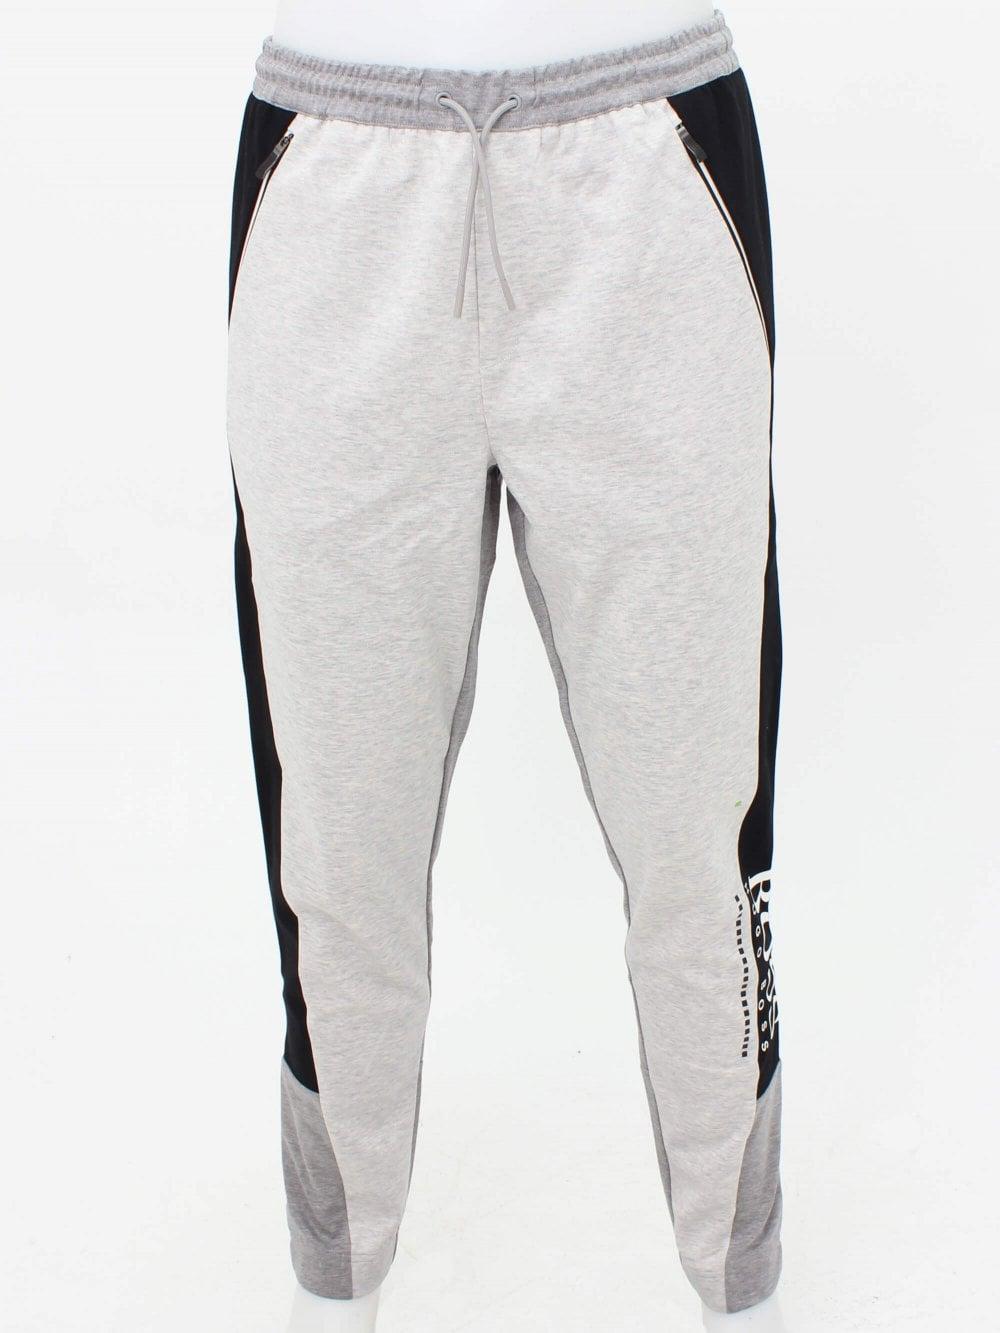 9f4dddcc9 Hugo Boss Athleisure HL Tech Sweatpants in Pastel Grey | Northern ...